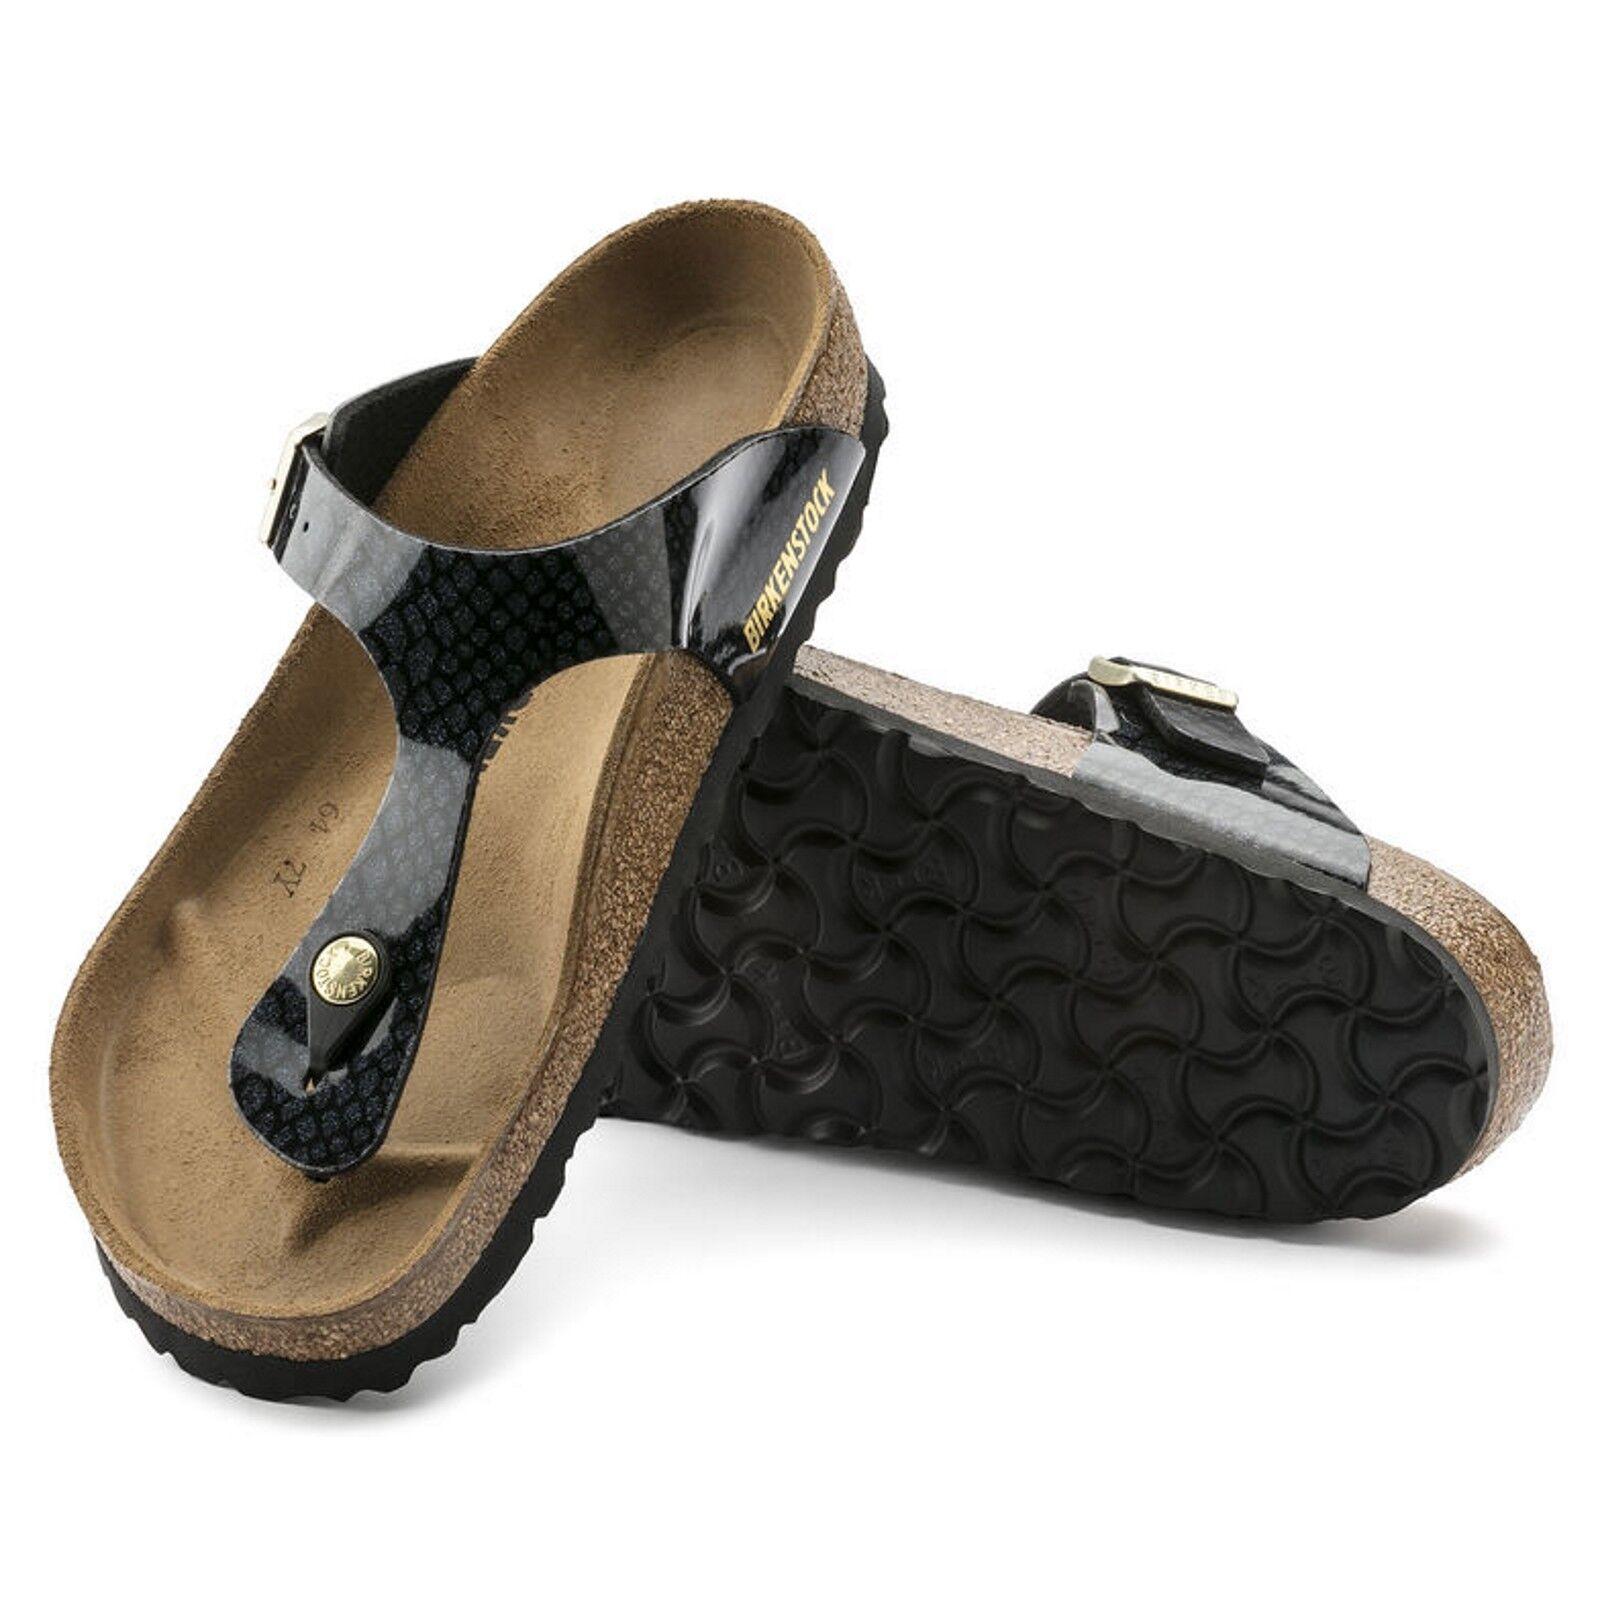 Free People Women's Zoe Leather Slingback Clogs Retail size 6